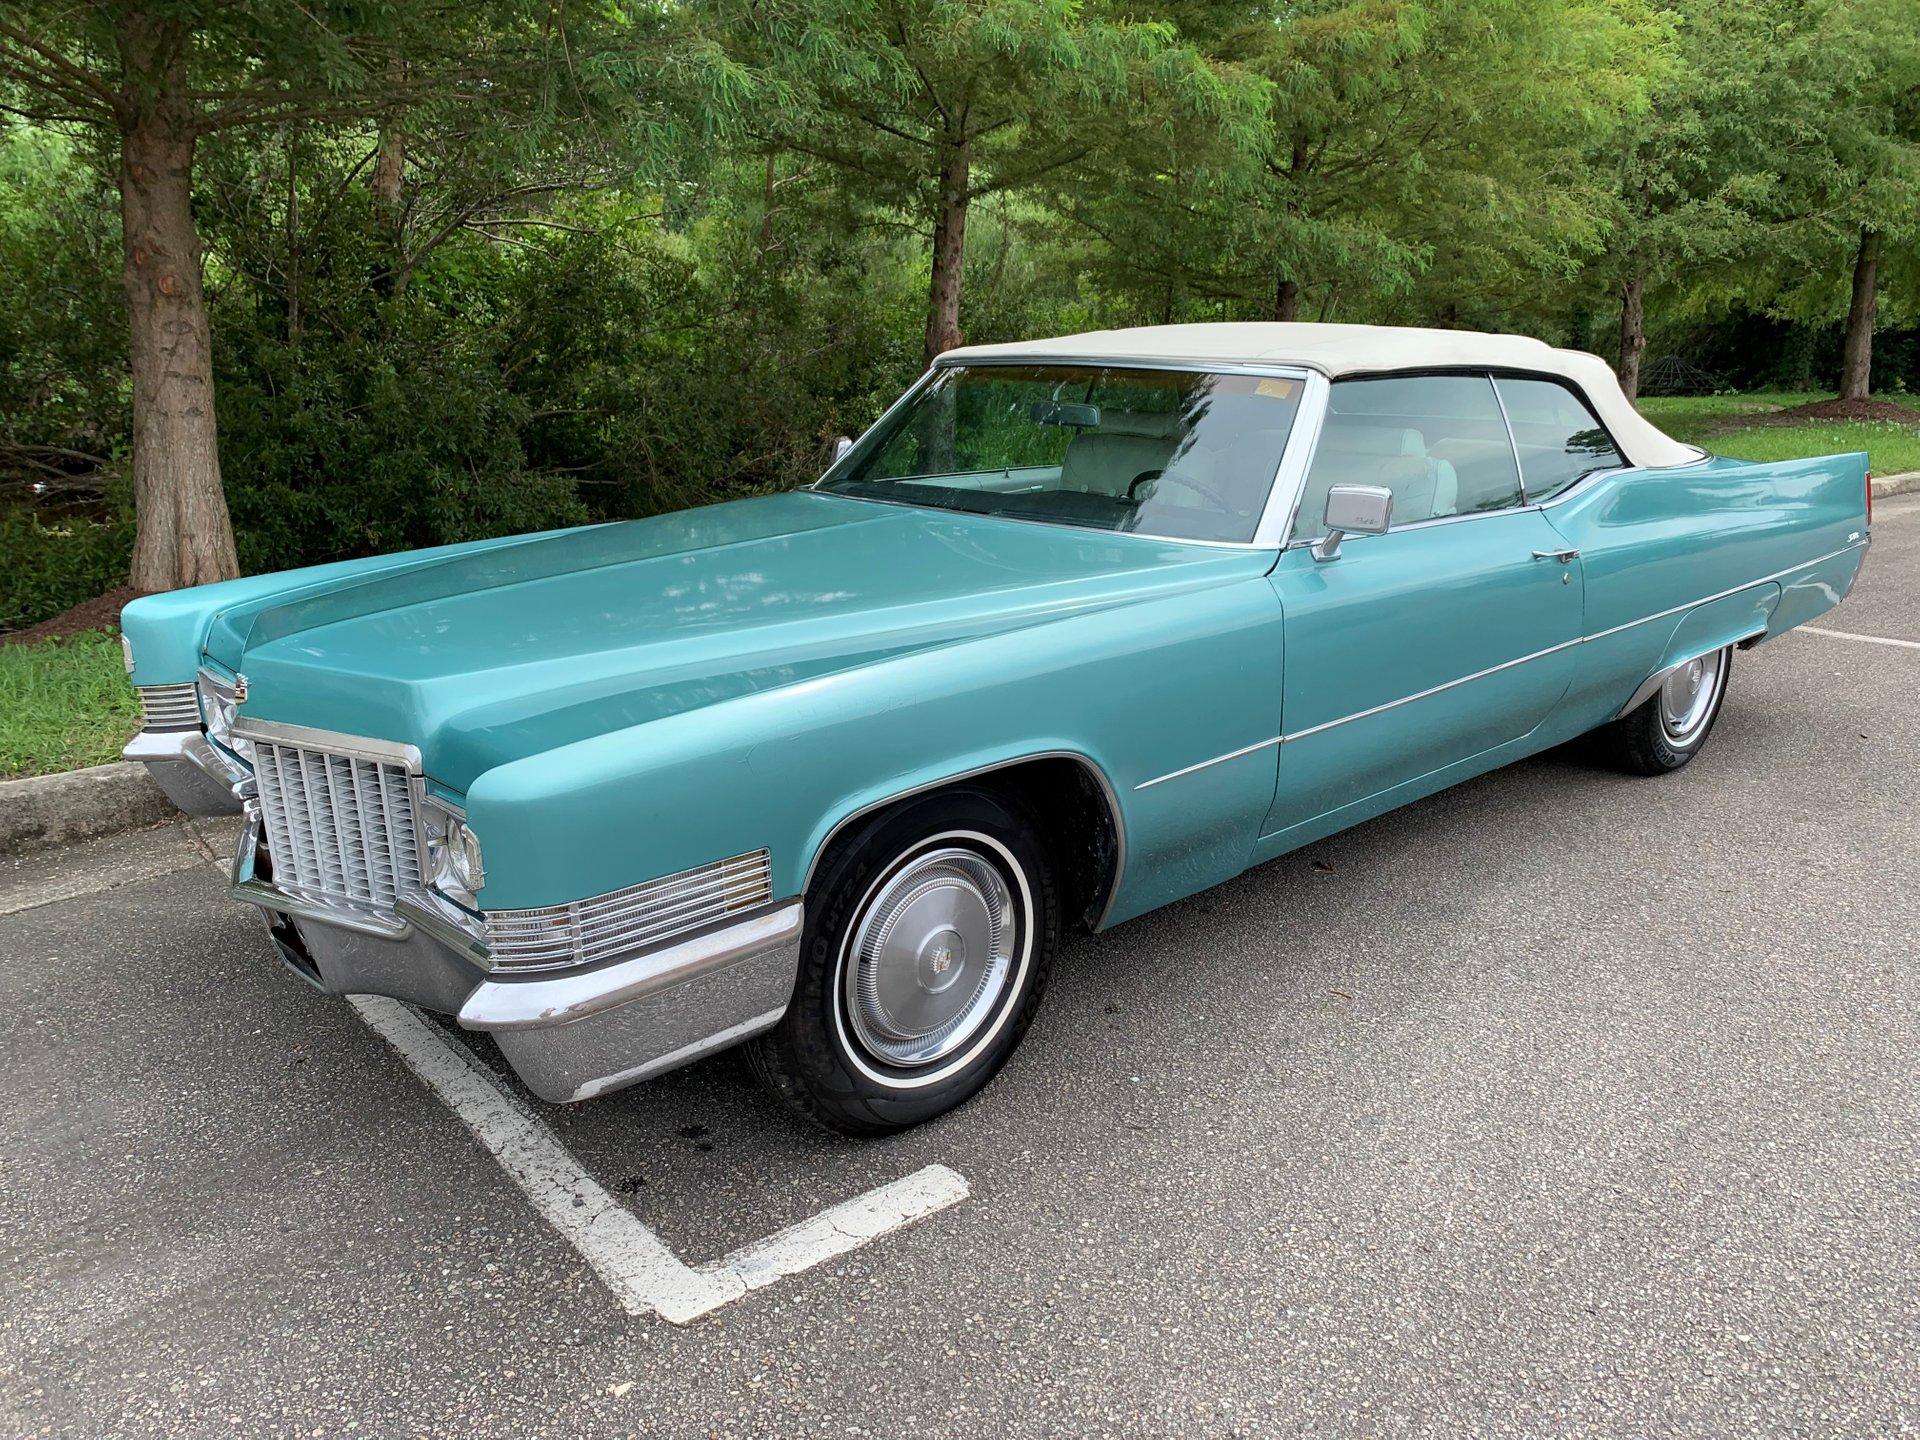 1970 Cadillac DeVille | GAA Classic Cars